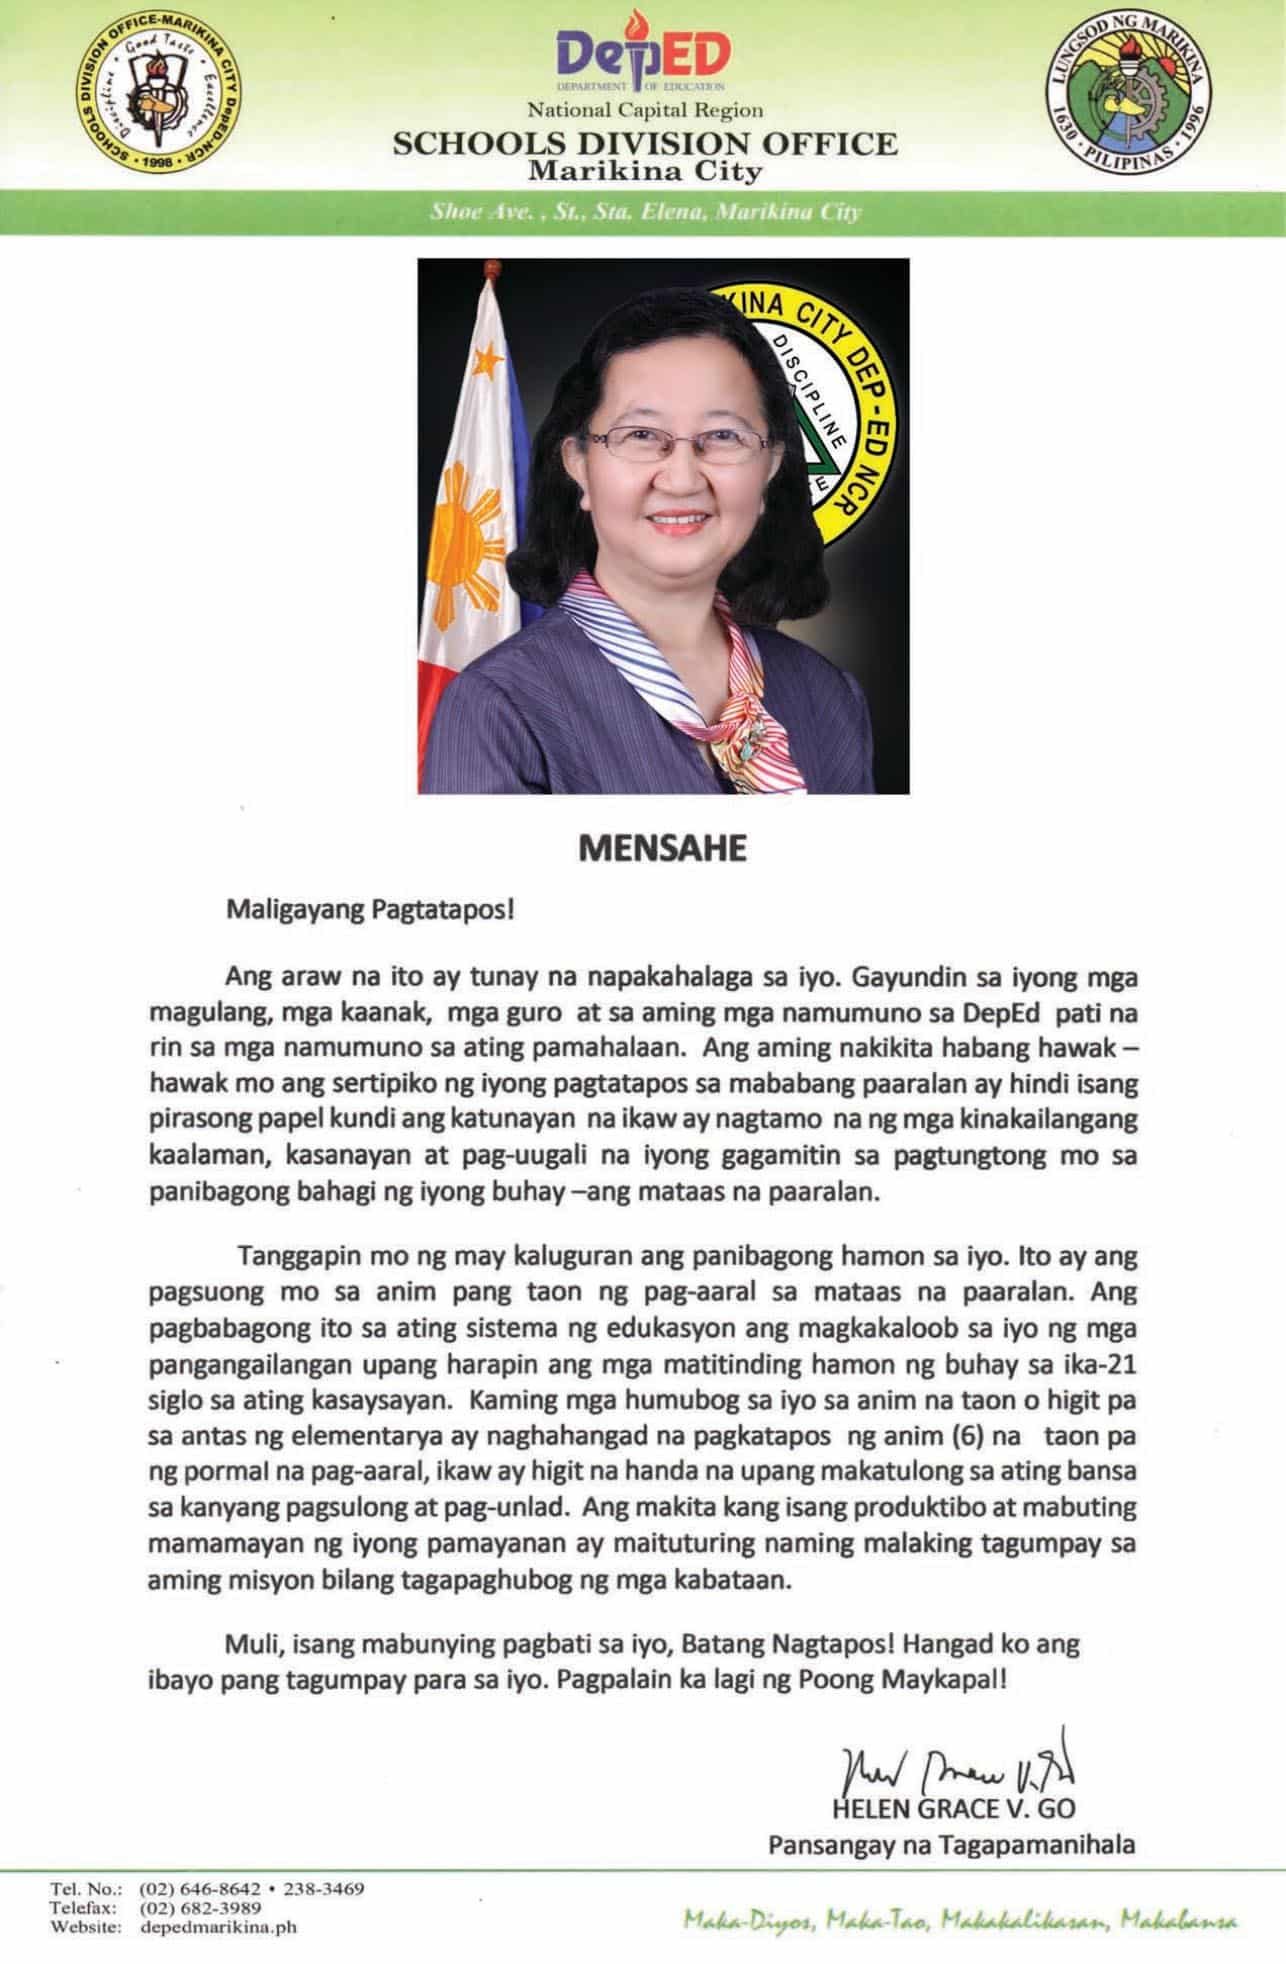 Graduation Message of Schools Division Superintendent Helen Grace Go